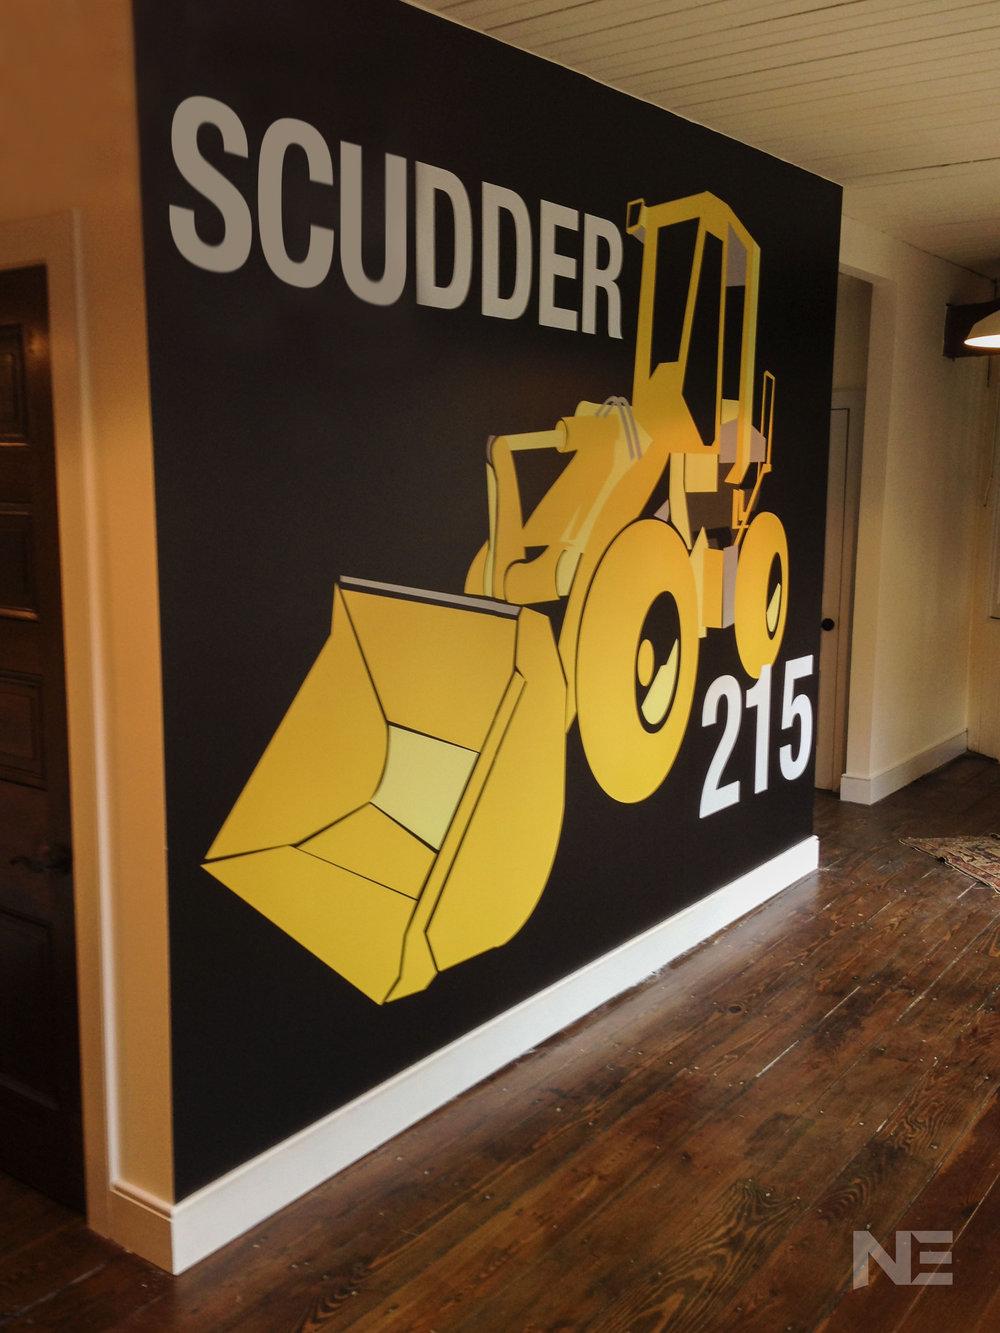 Scudder 27